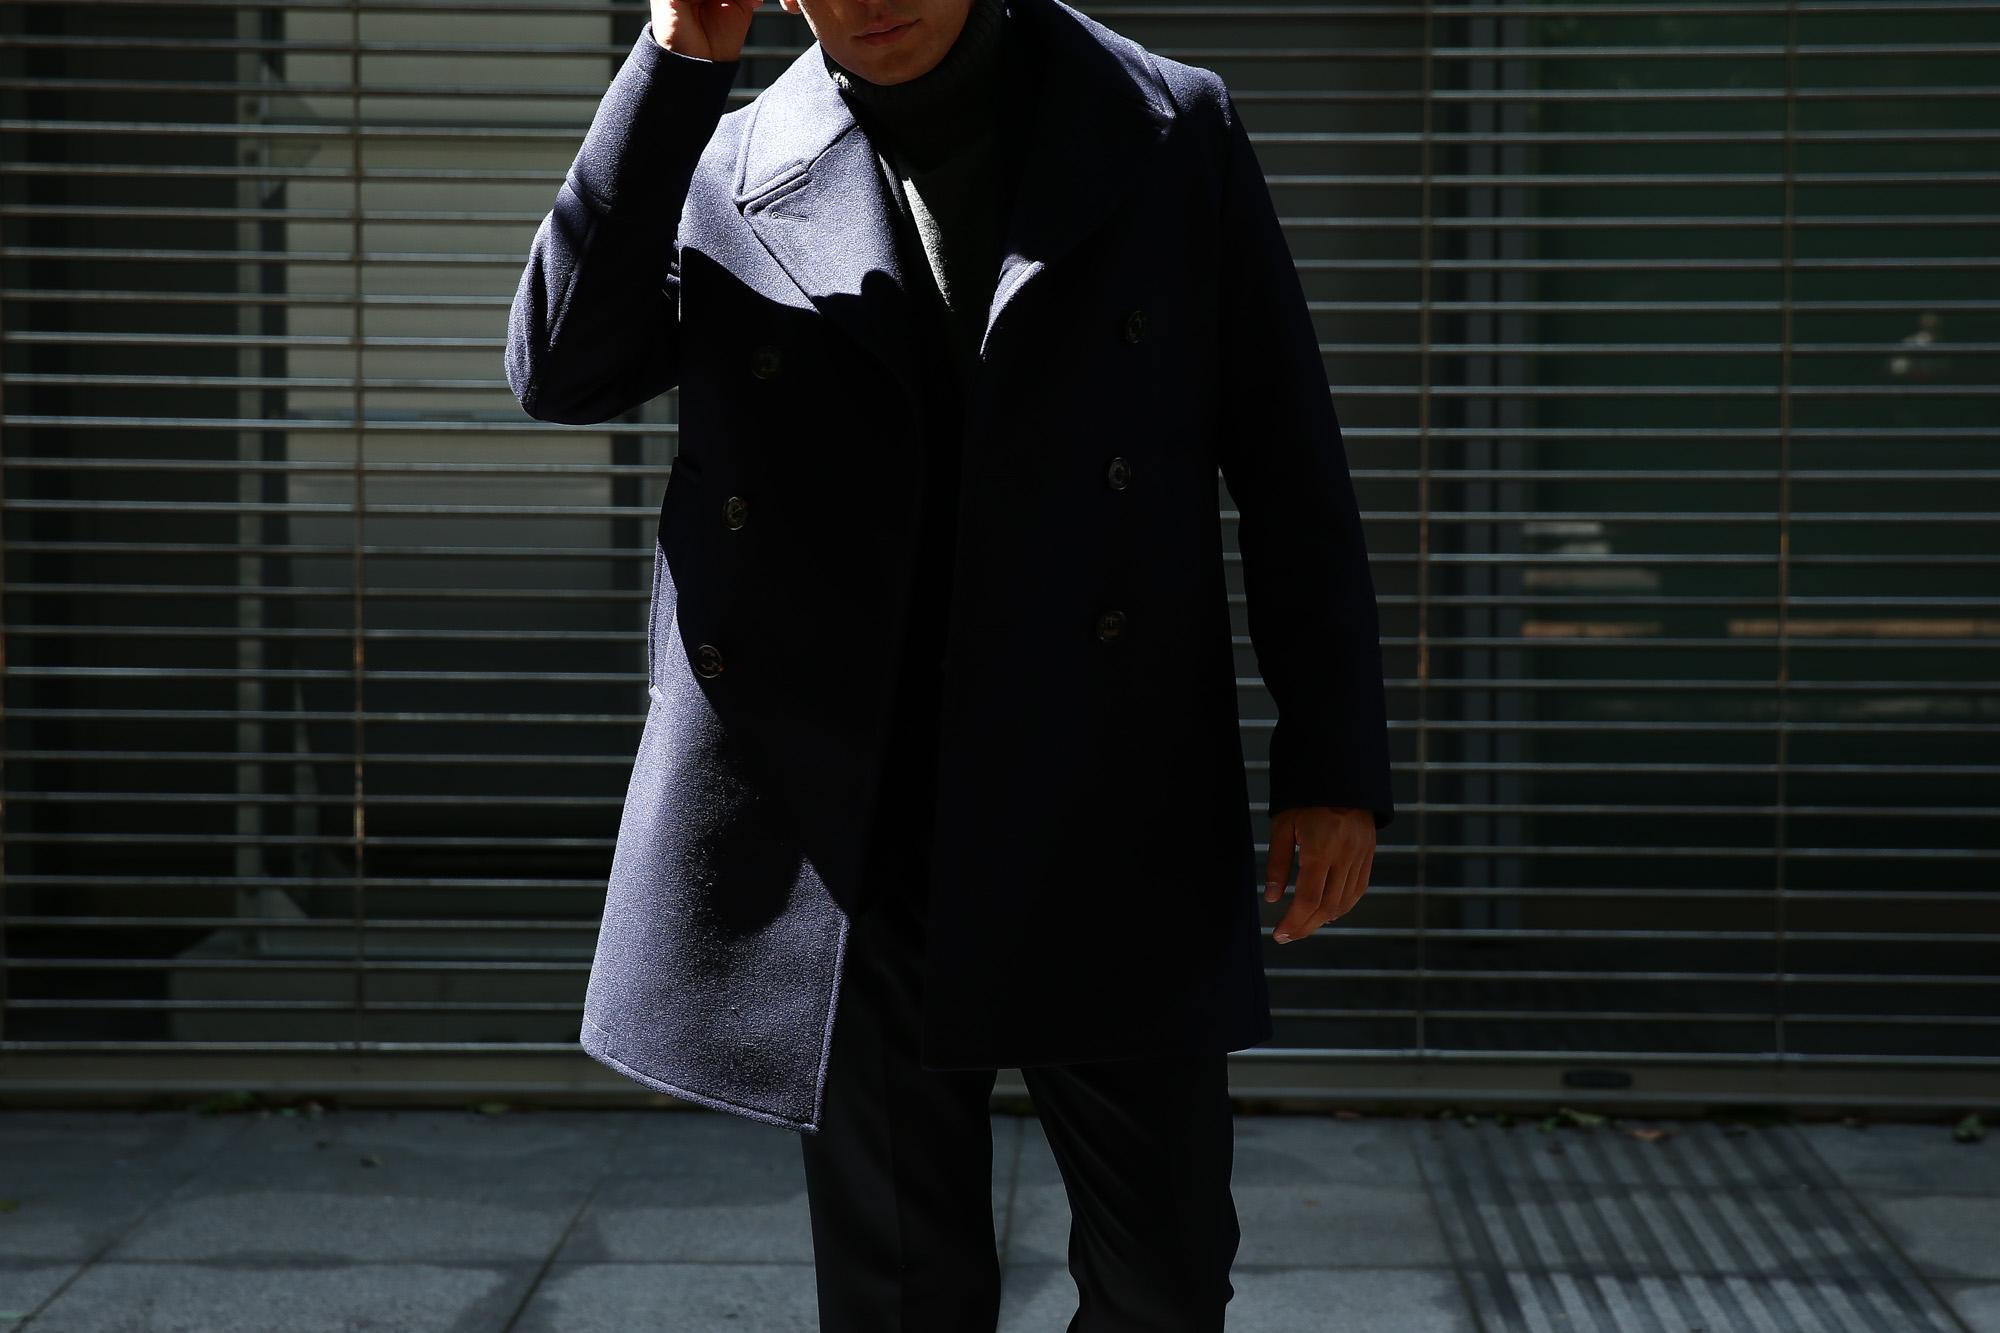 Sealup(シーラップ) 【GENOVA //// ジェノバ】 50002 7591 01 メルトンウール サーモアライニング ロングPコート Pコート ロング ピーコート NAVY (ネイビー・01) MADE IN ITALY(イタリア製) 2017 秋冬新作 sealup シーラップ 愛知 名古屋 ZODIAC ゾディアック セレクトショップ シーラップPコート コート 44,46,48,50,52